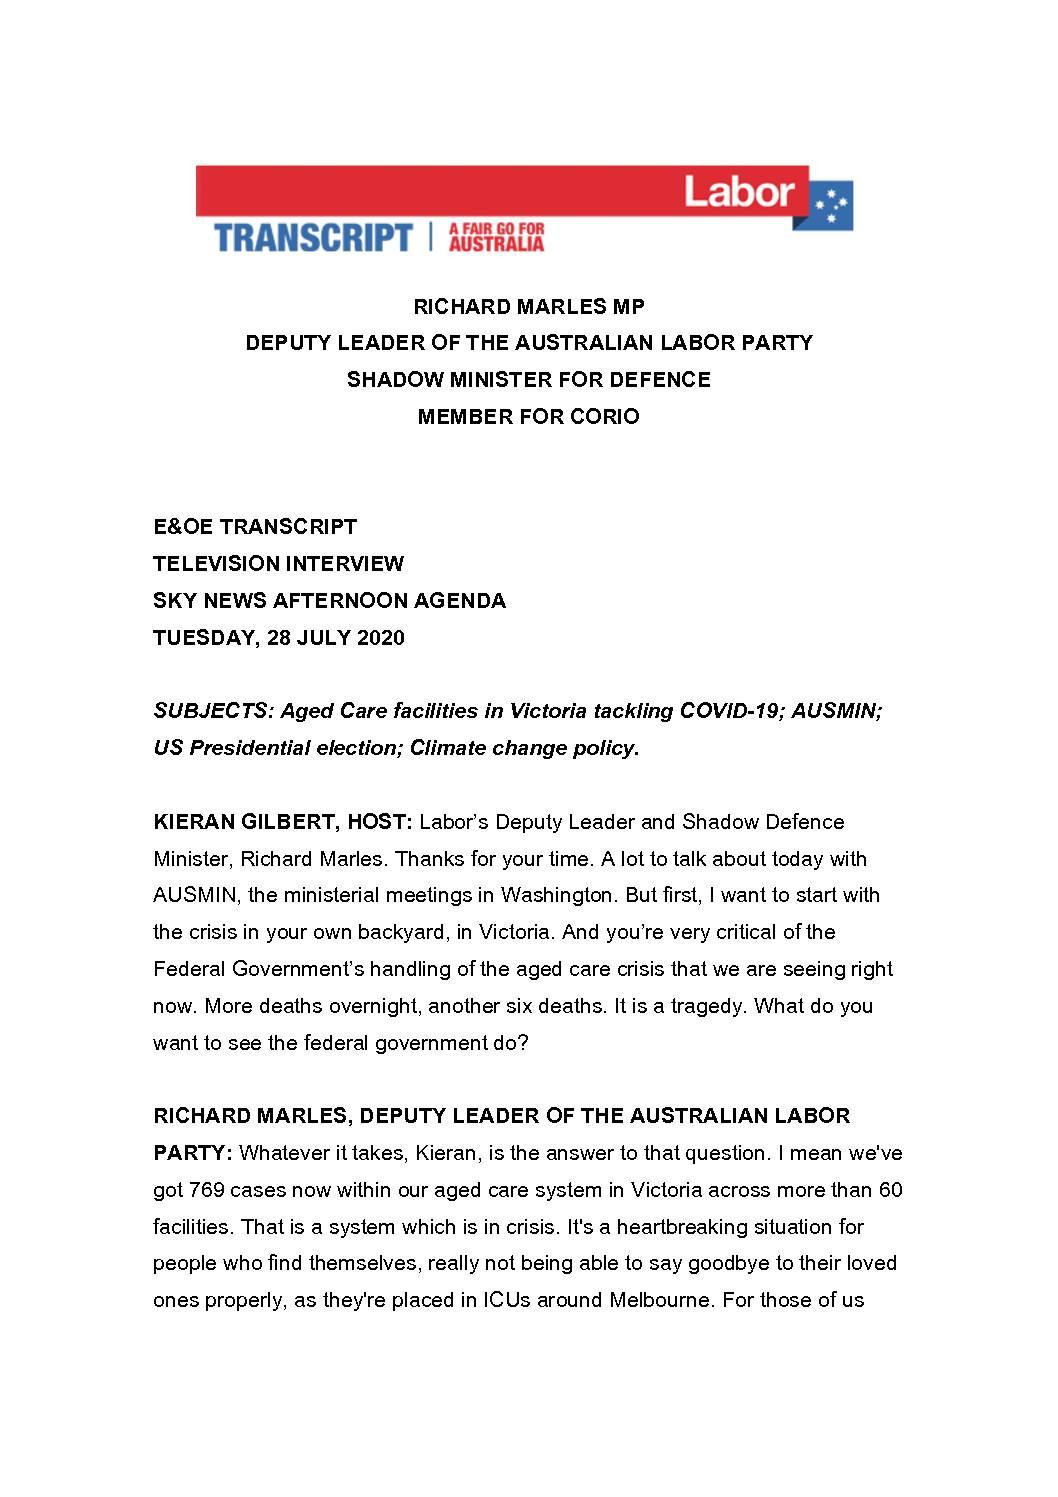 20.07.28-SKY-NEWS-AFTERNOON-AGENDA-WITH-KIERAN-GILBERT-TRANSCRIPT